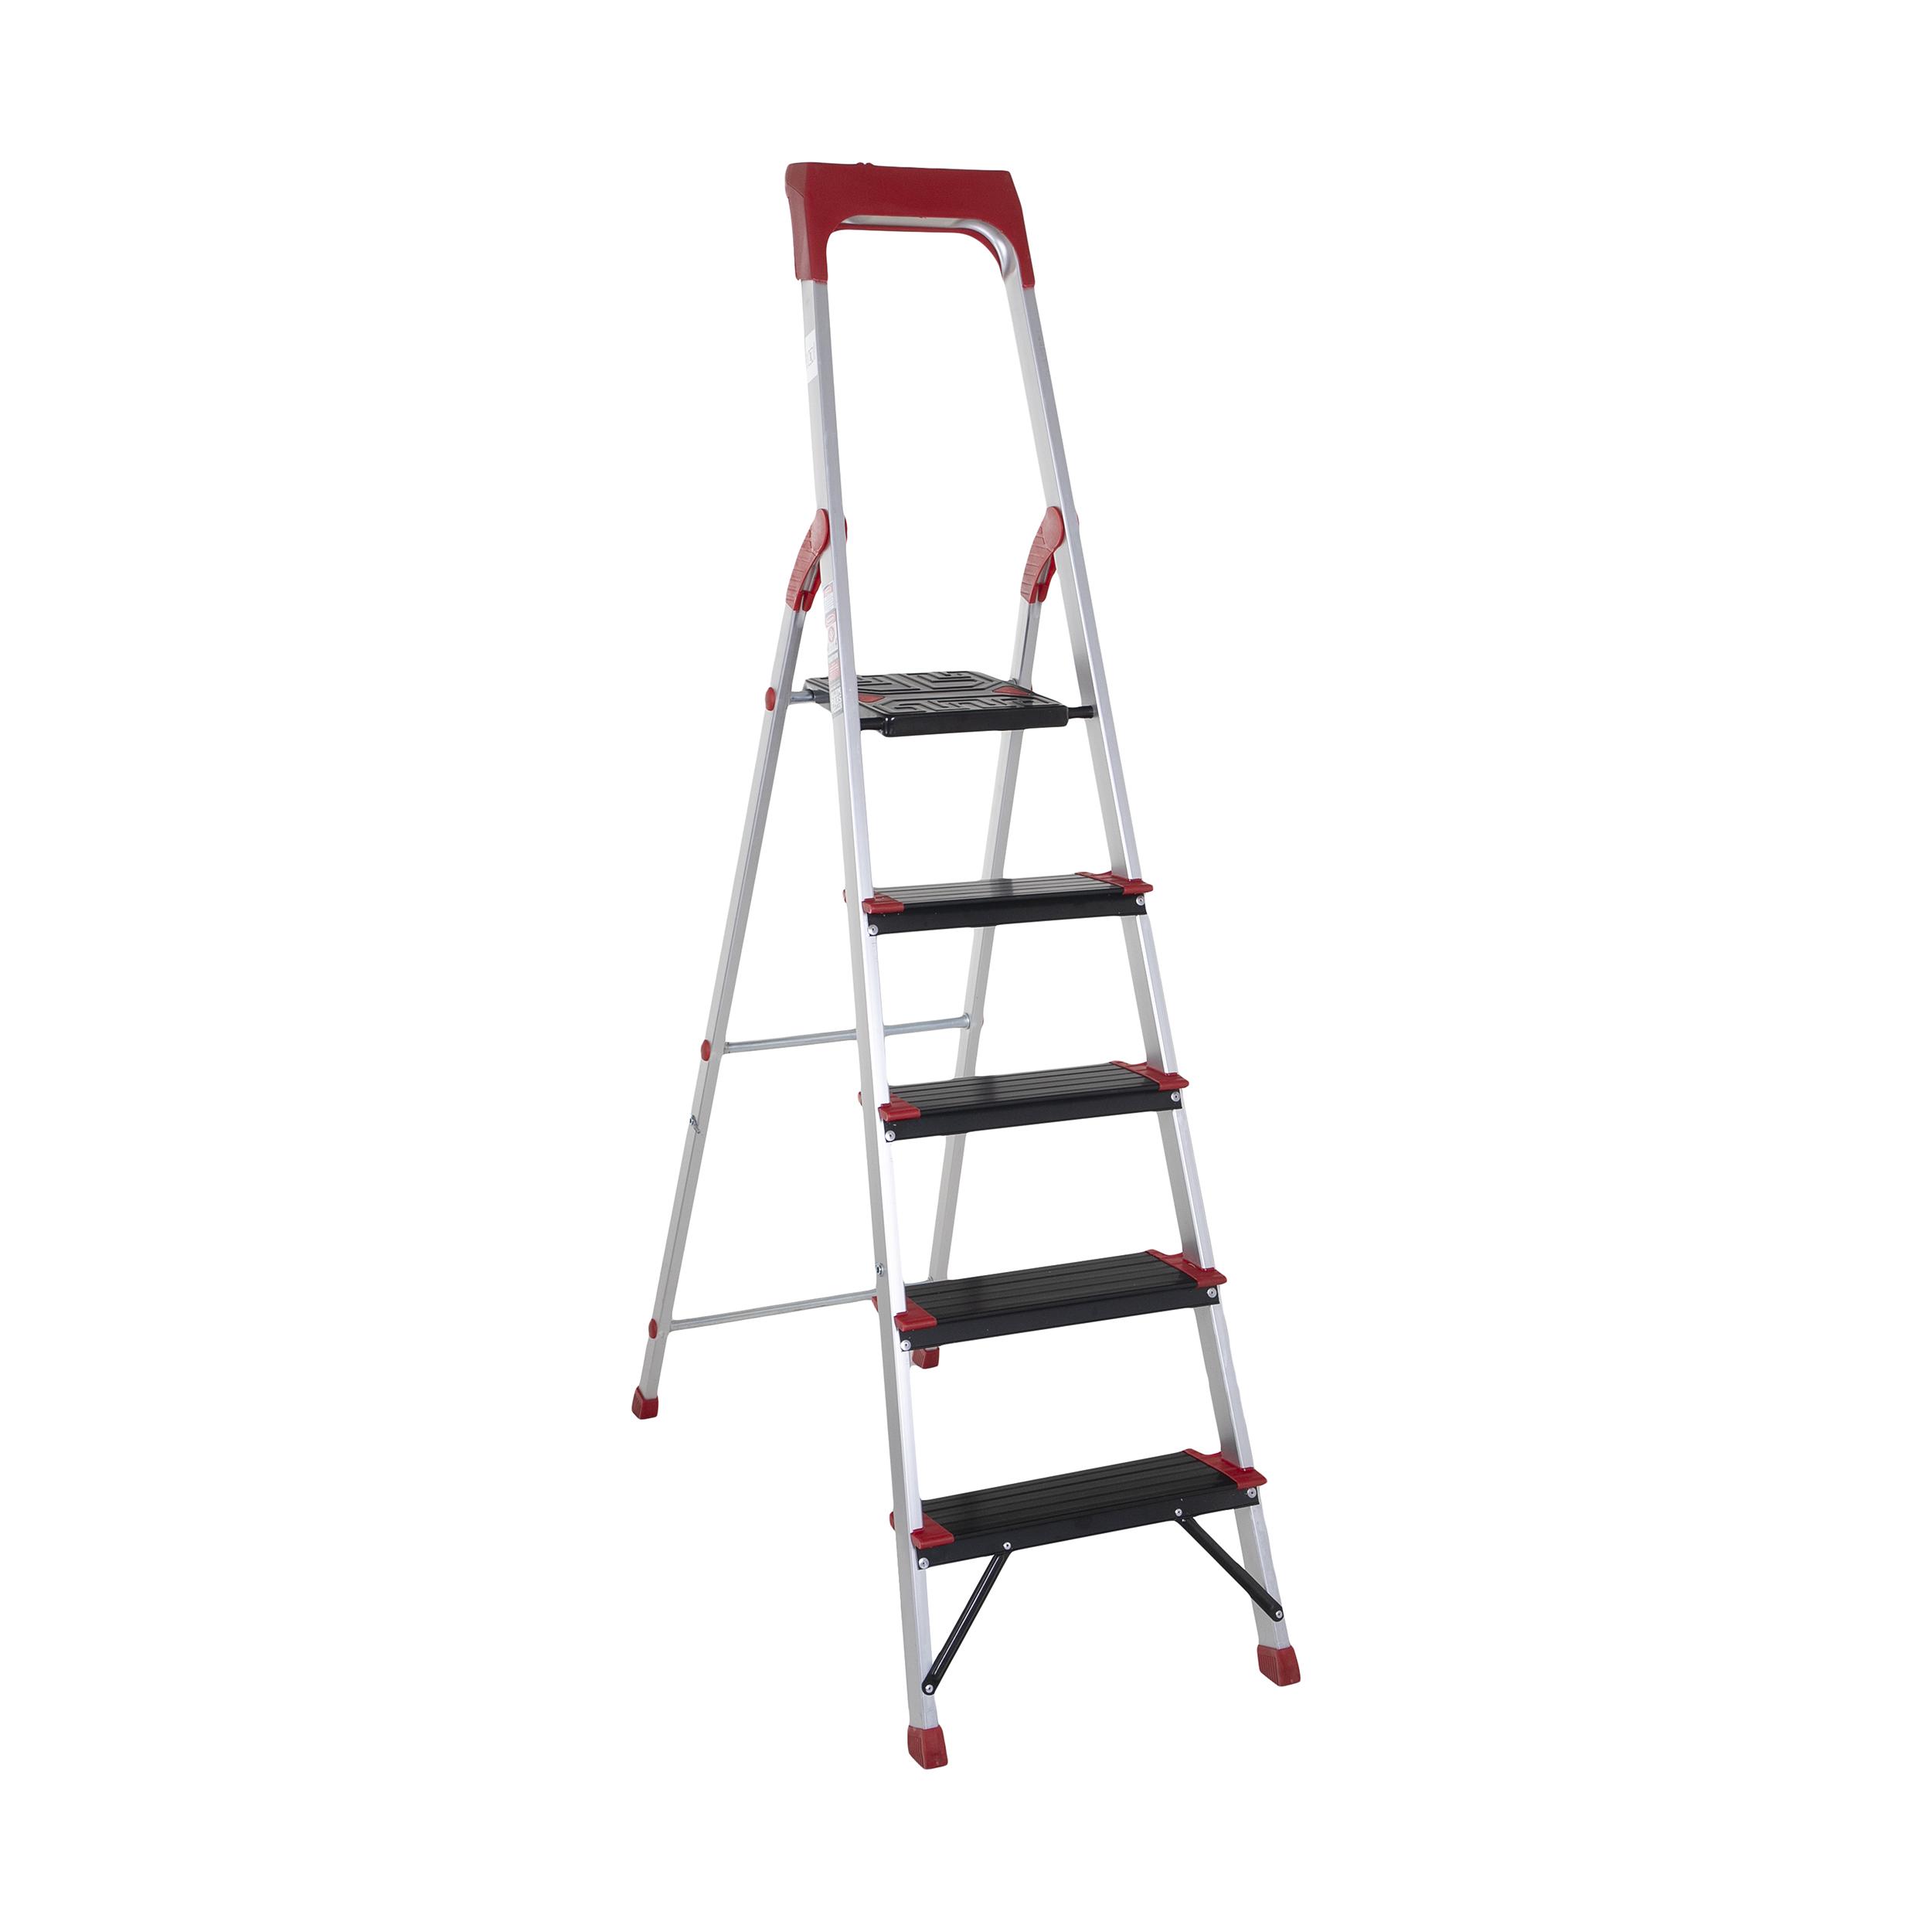 نردبان 5 پله آلوم پارس پله مدل کلاسیک